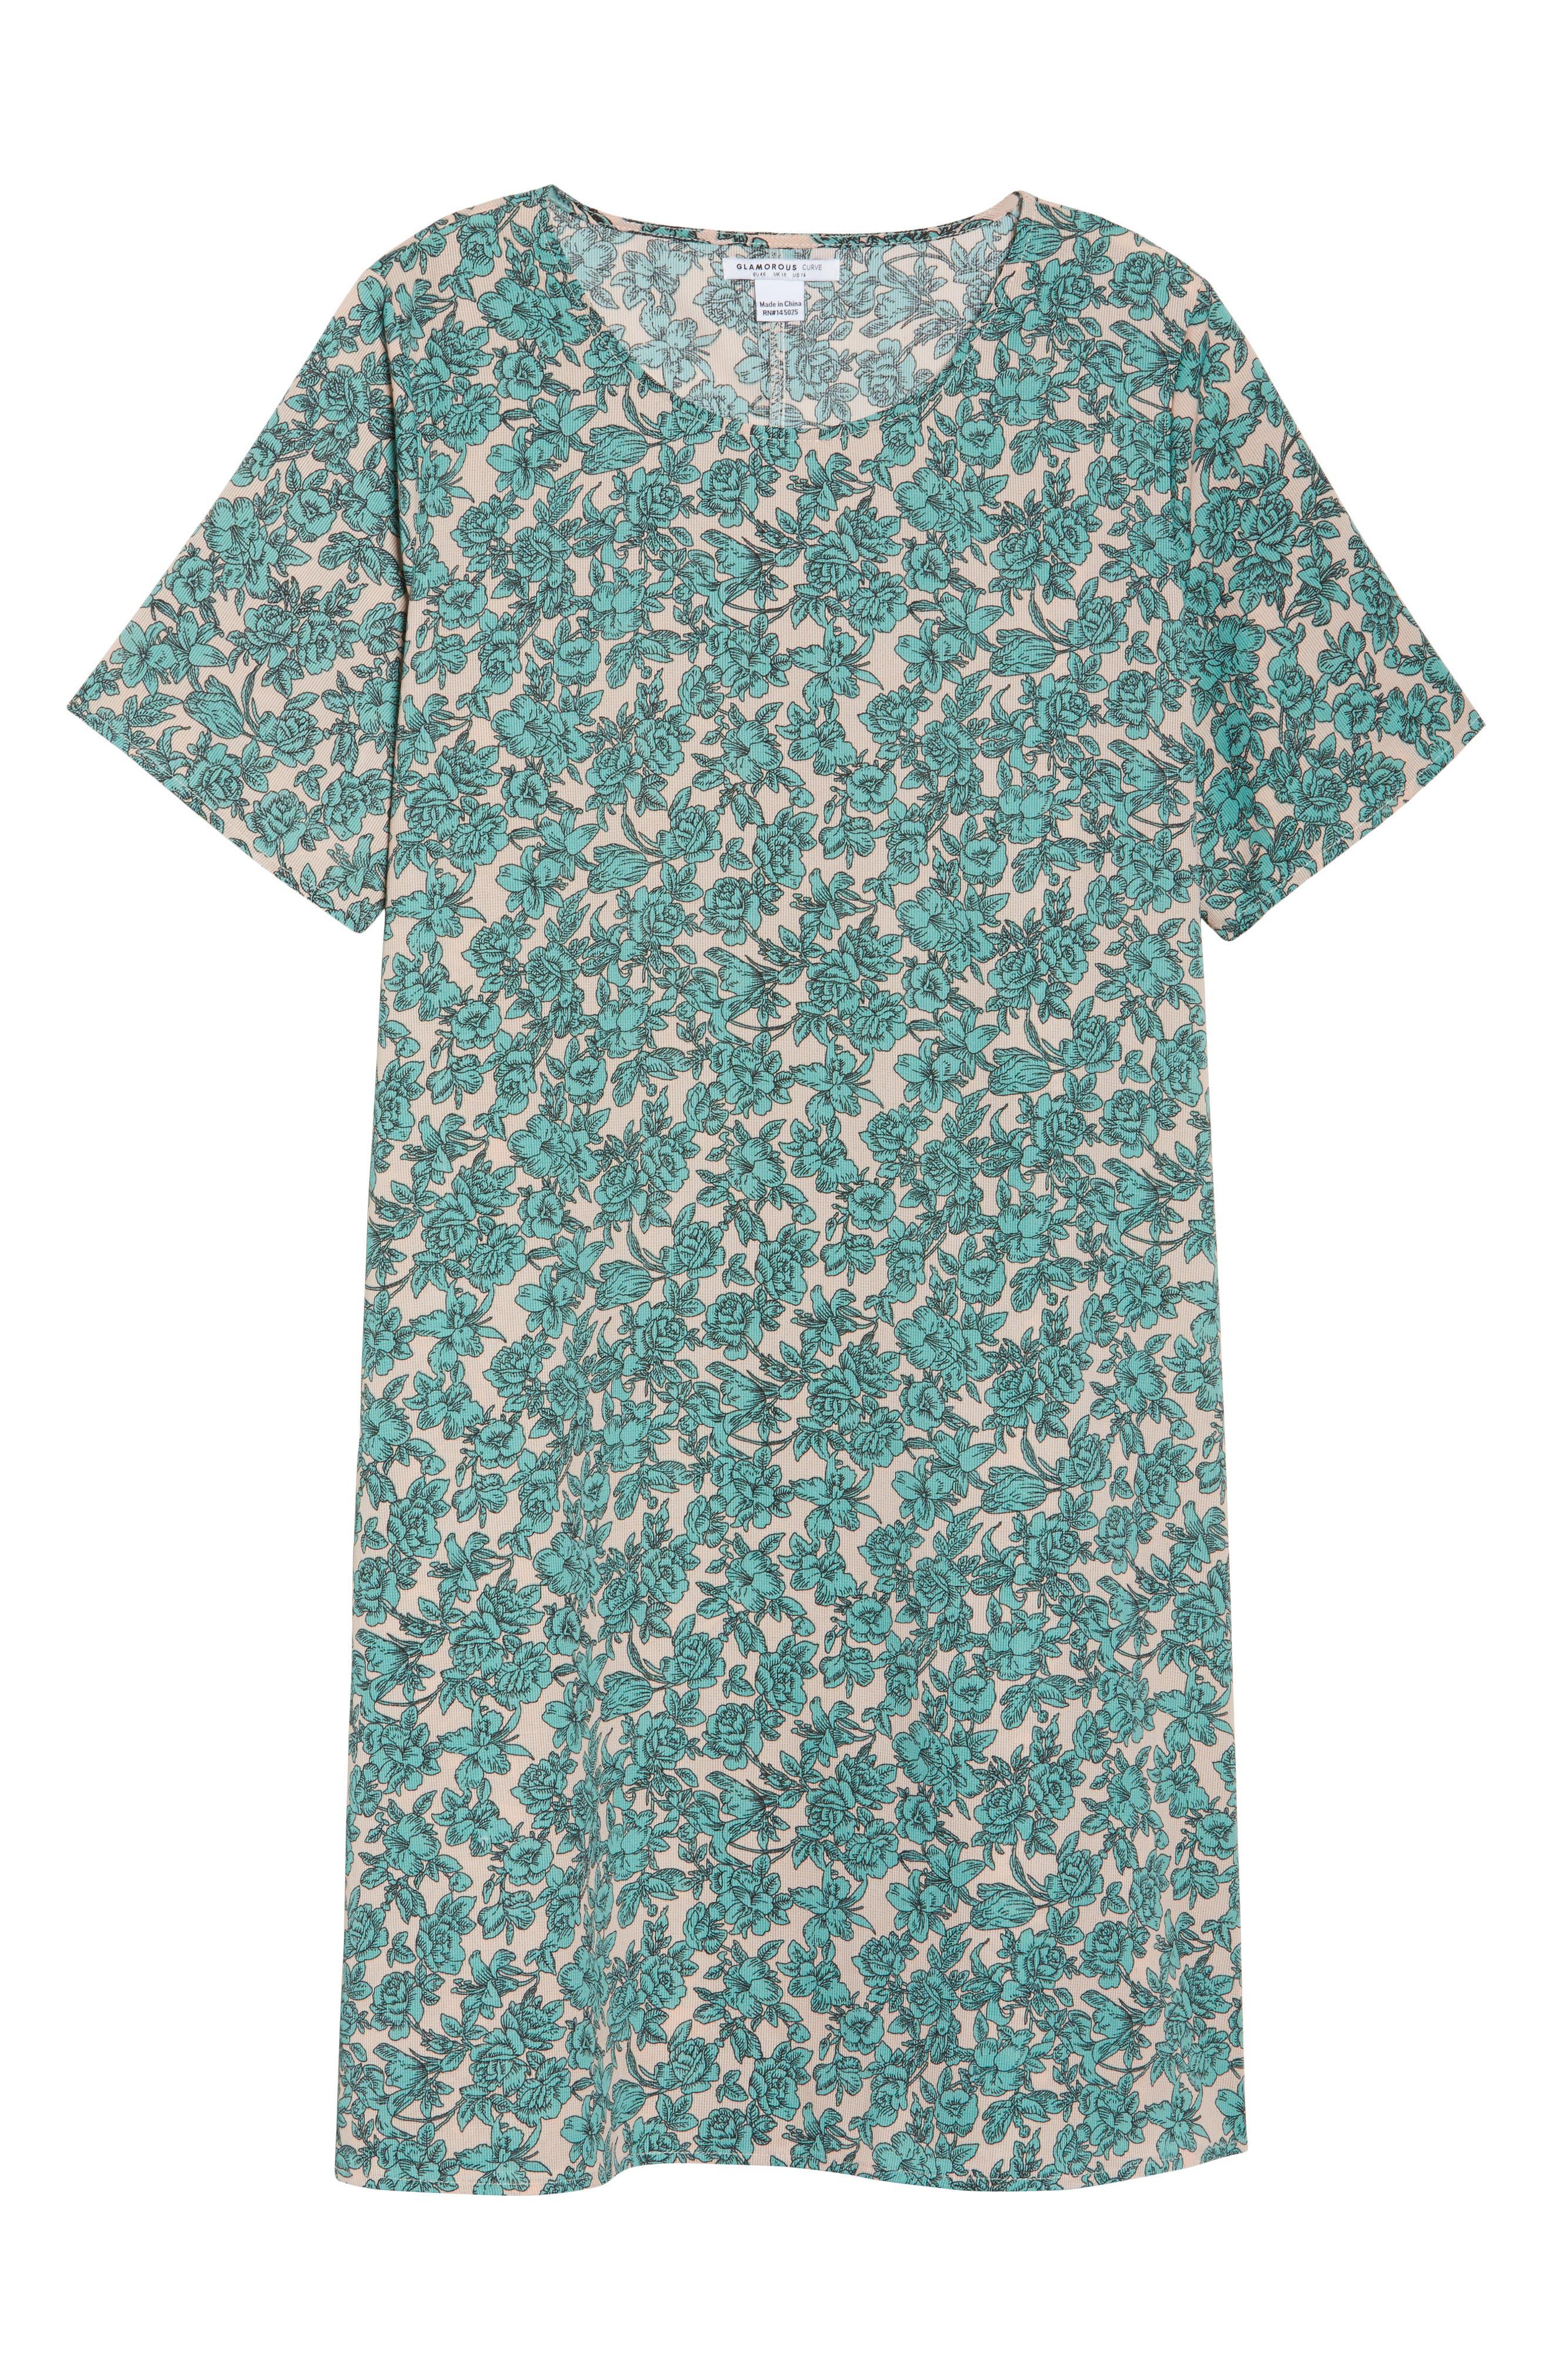 Floral Shift Dress,                             Alternate thumbnail 6, color,                             300